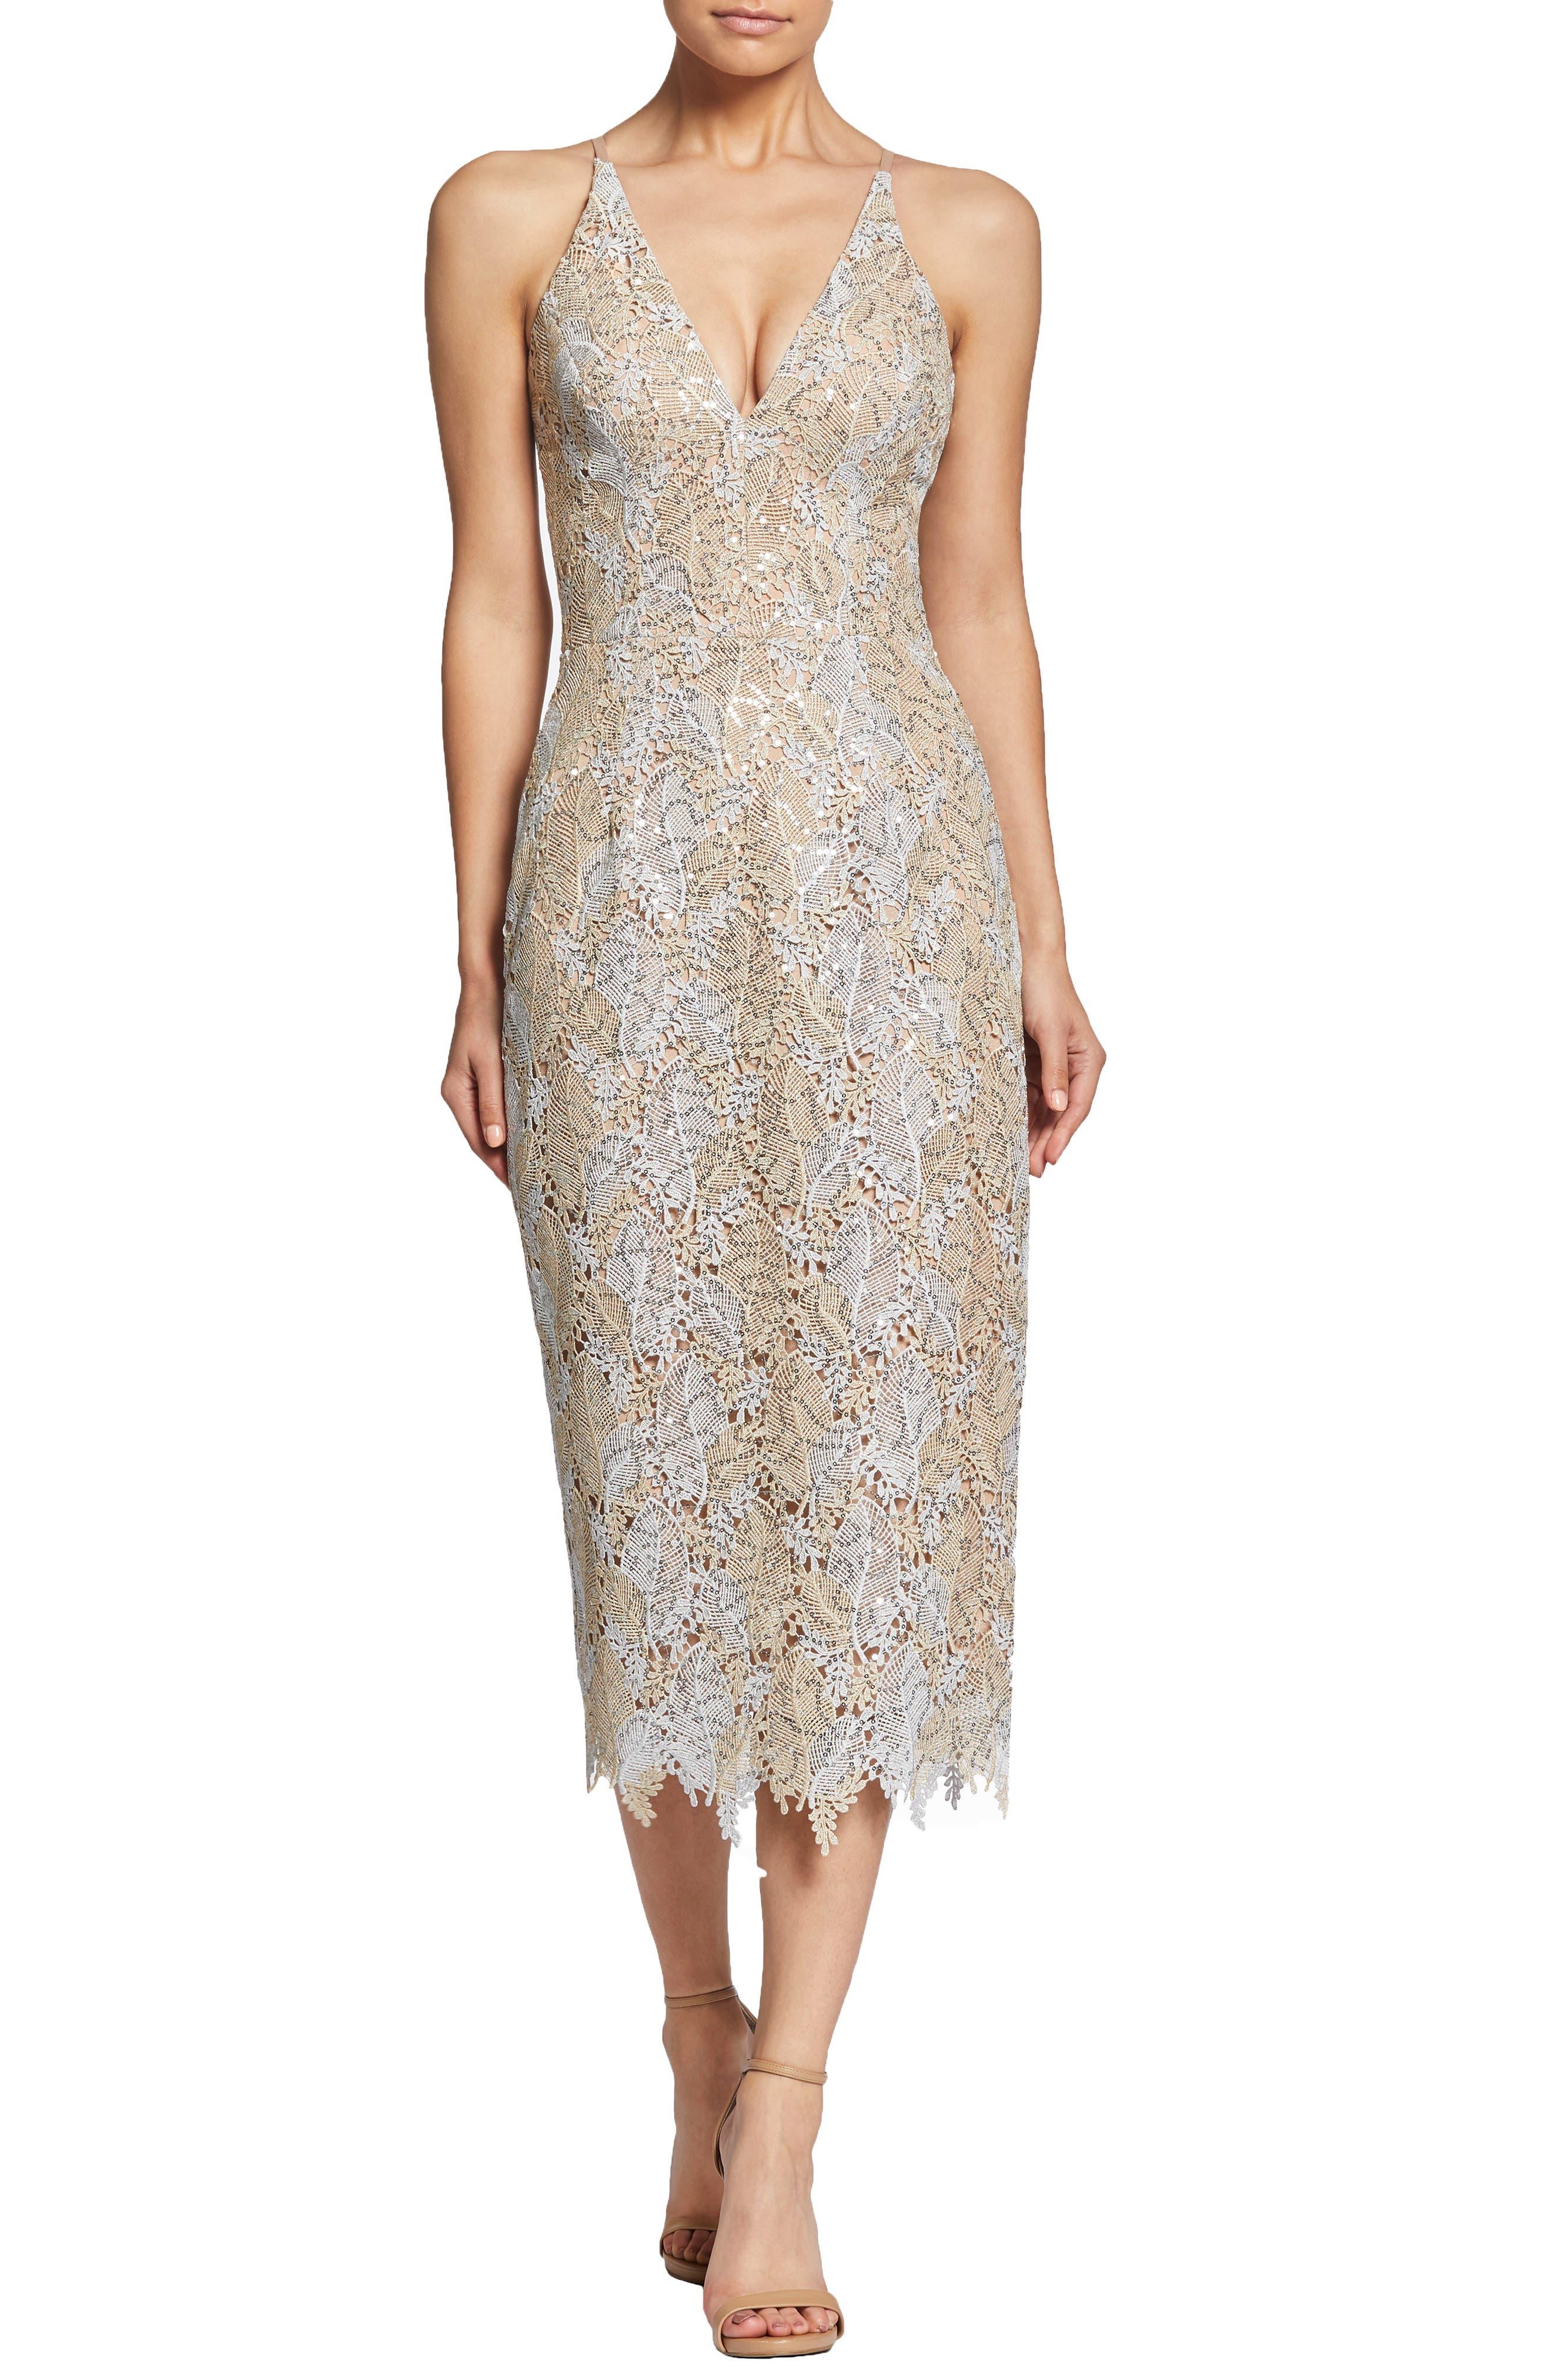 DRESS THE POPULATION, Aurora Lace Sheath Dress, Main thumbnail 1, color, PLATINUM/ GOLD